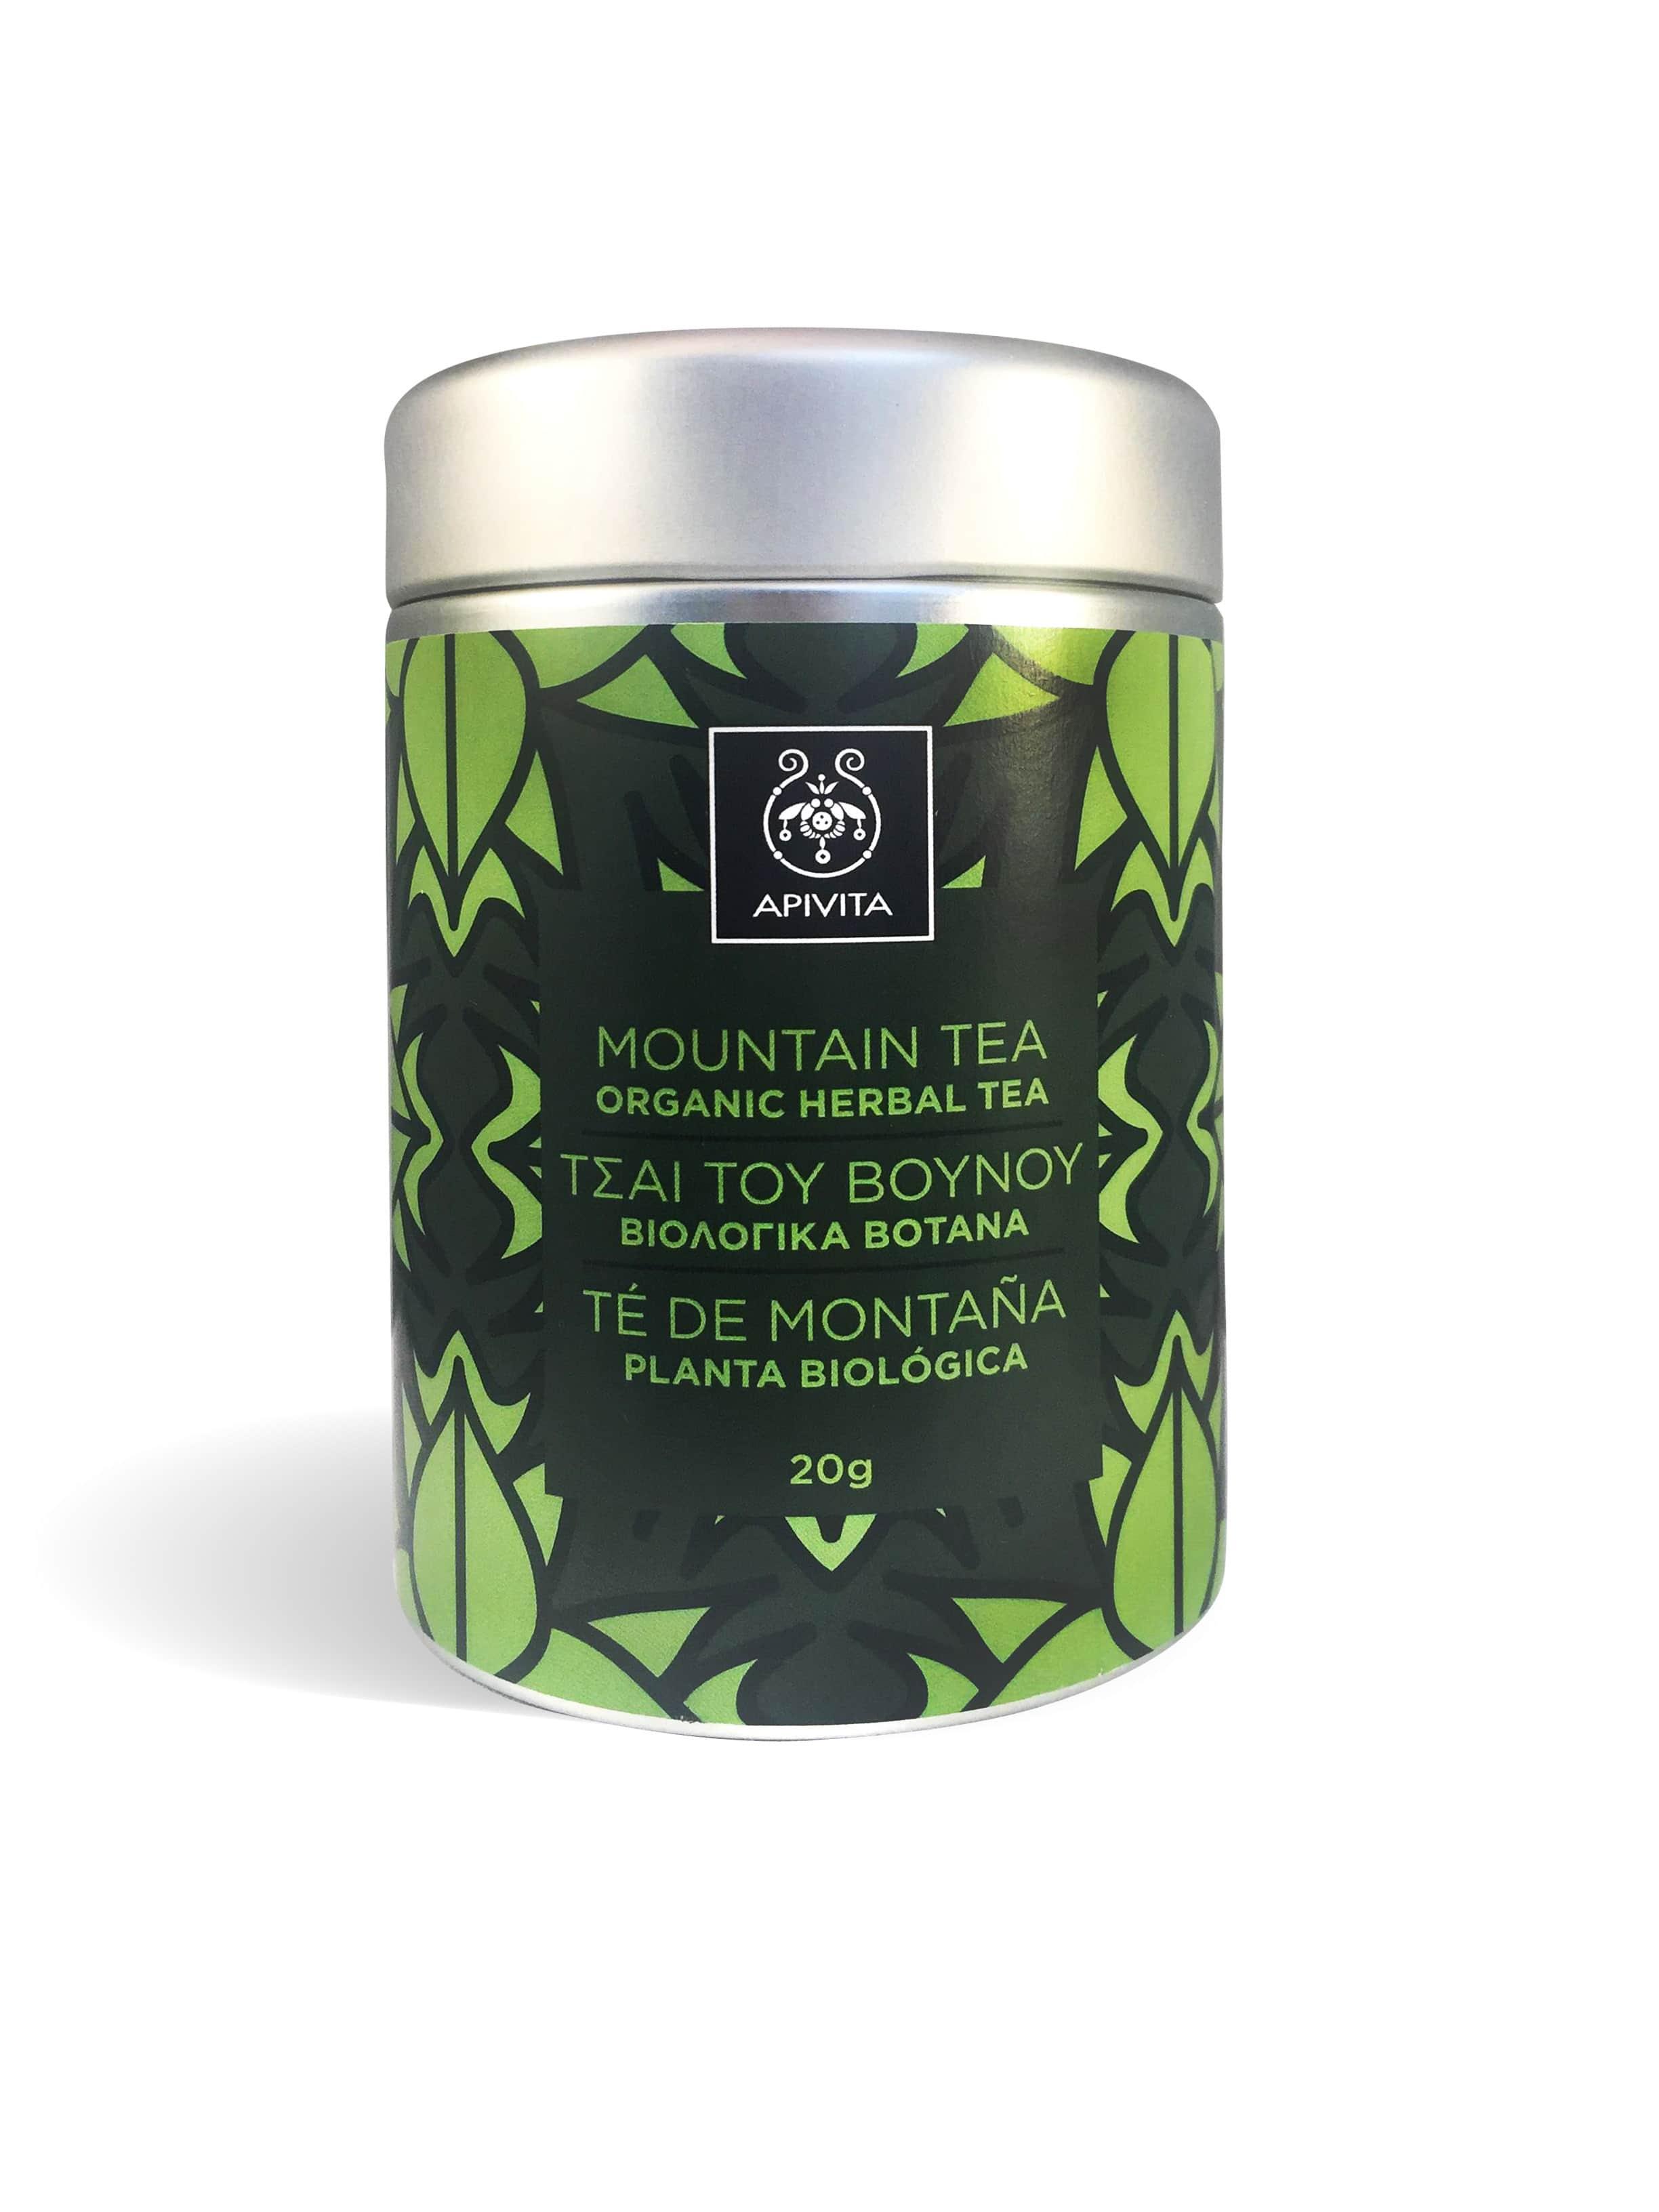 Apivita Τσάϊ του Βουνού από Βιολογικά Βότανα, 20gr